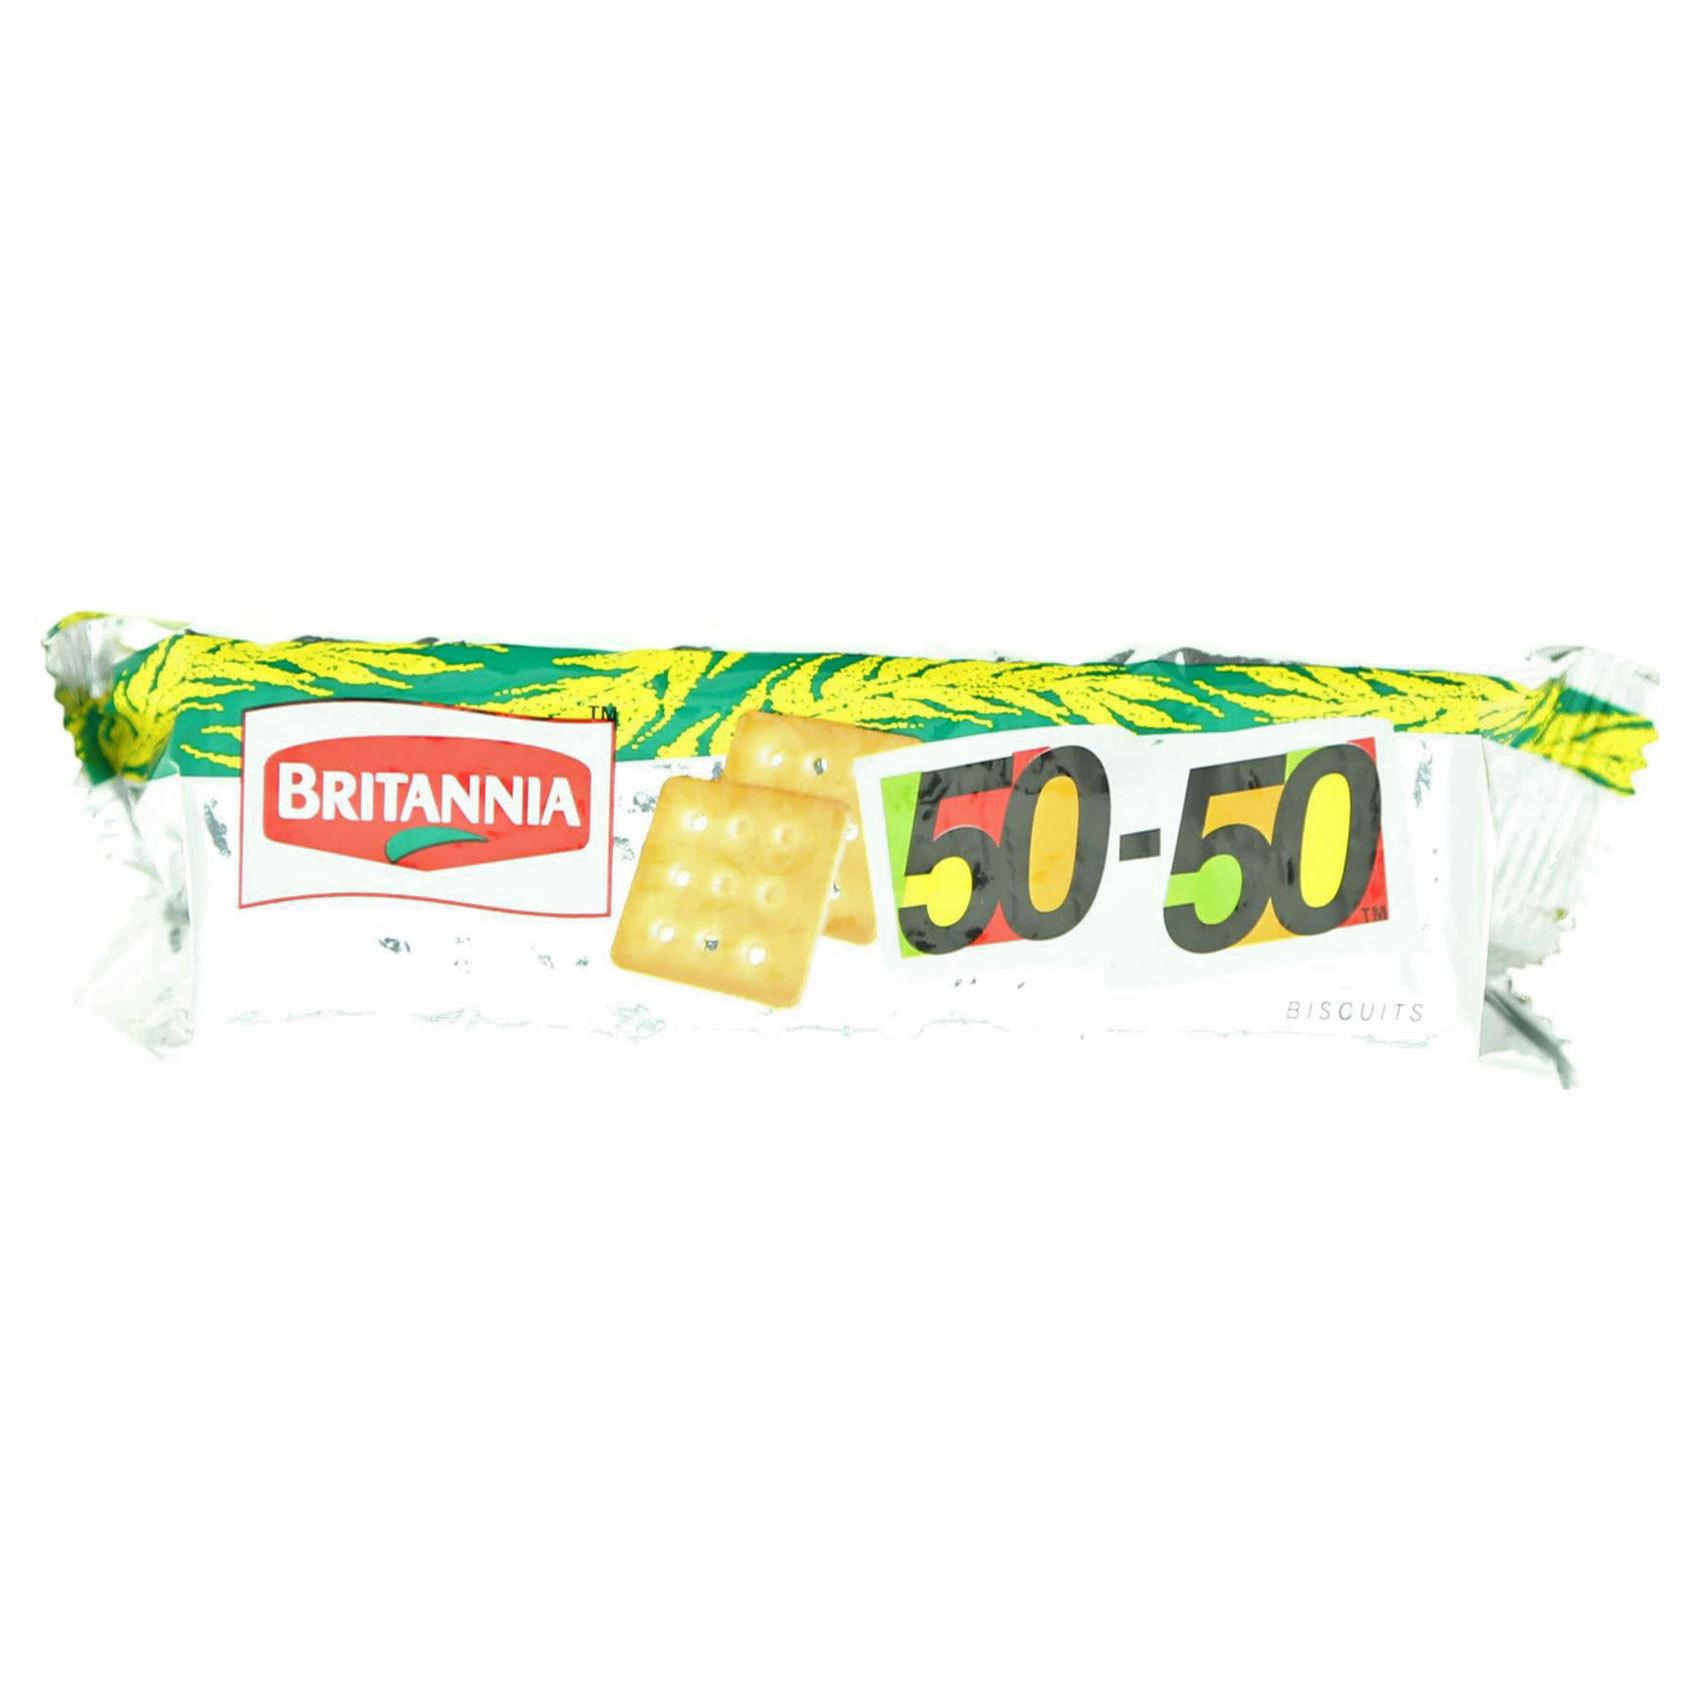 BRITANNIA BISCUITS 50-50 71GR